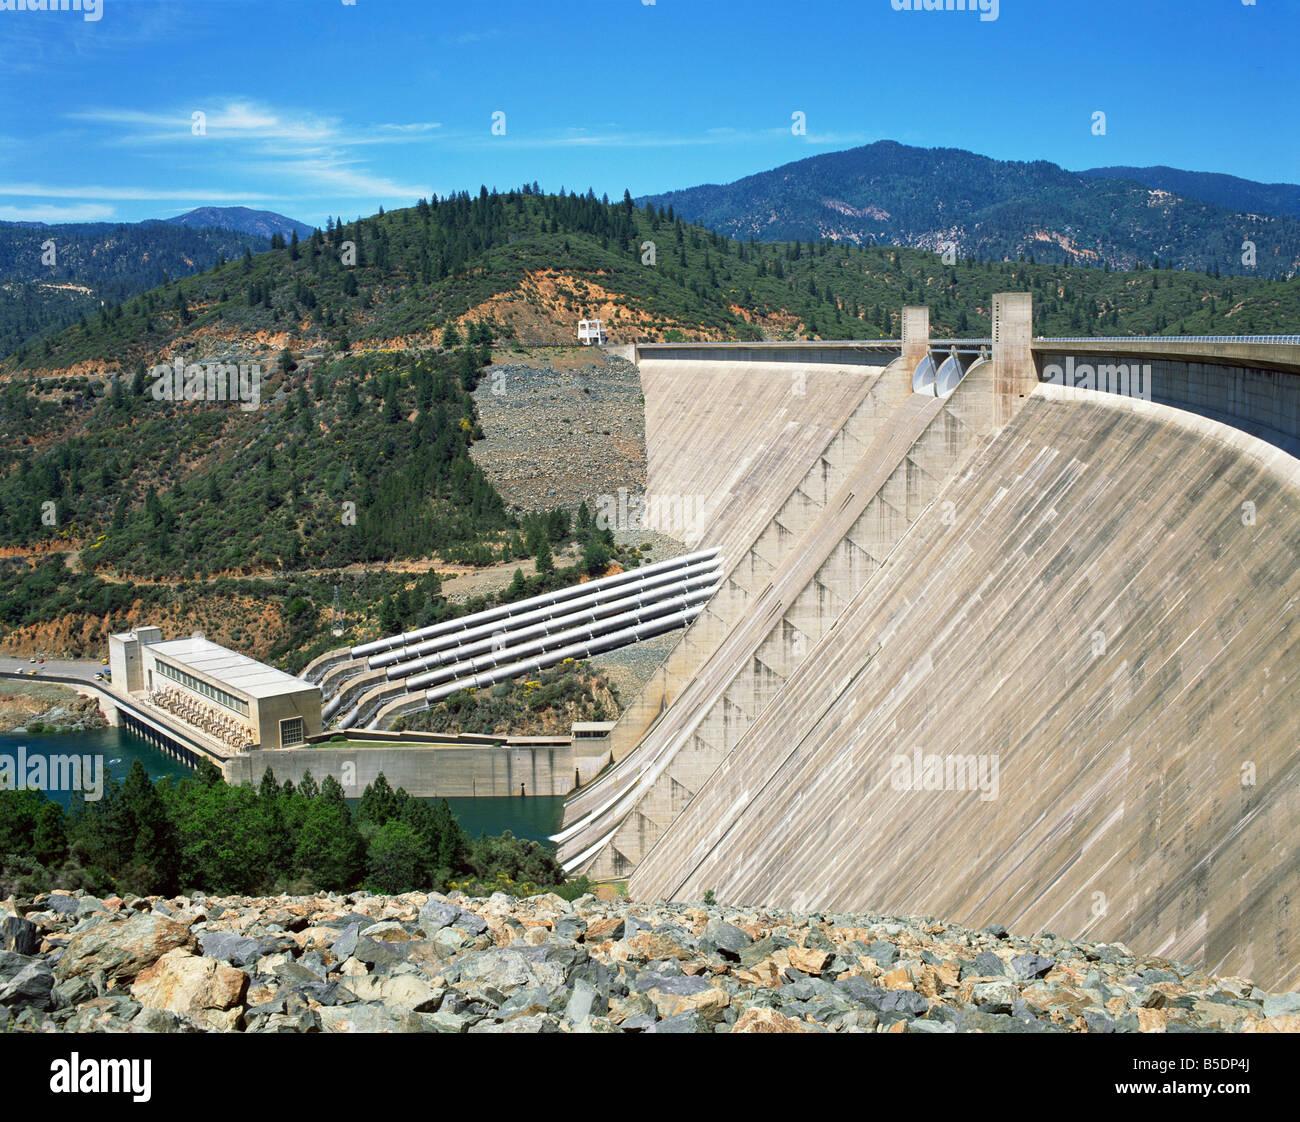 The Redding Shasta Dam in California, USA, North America - Stock Image